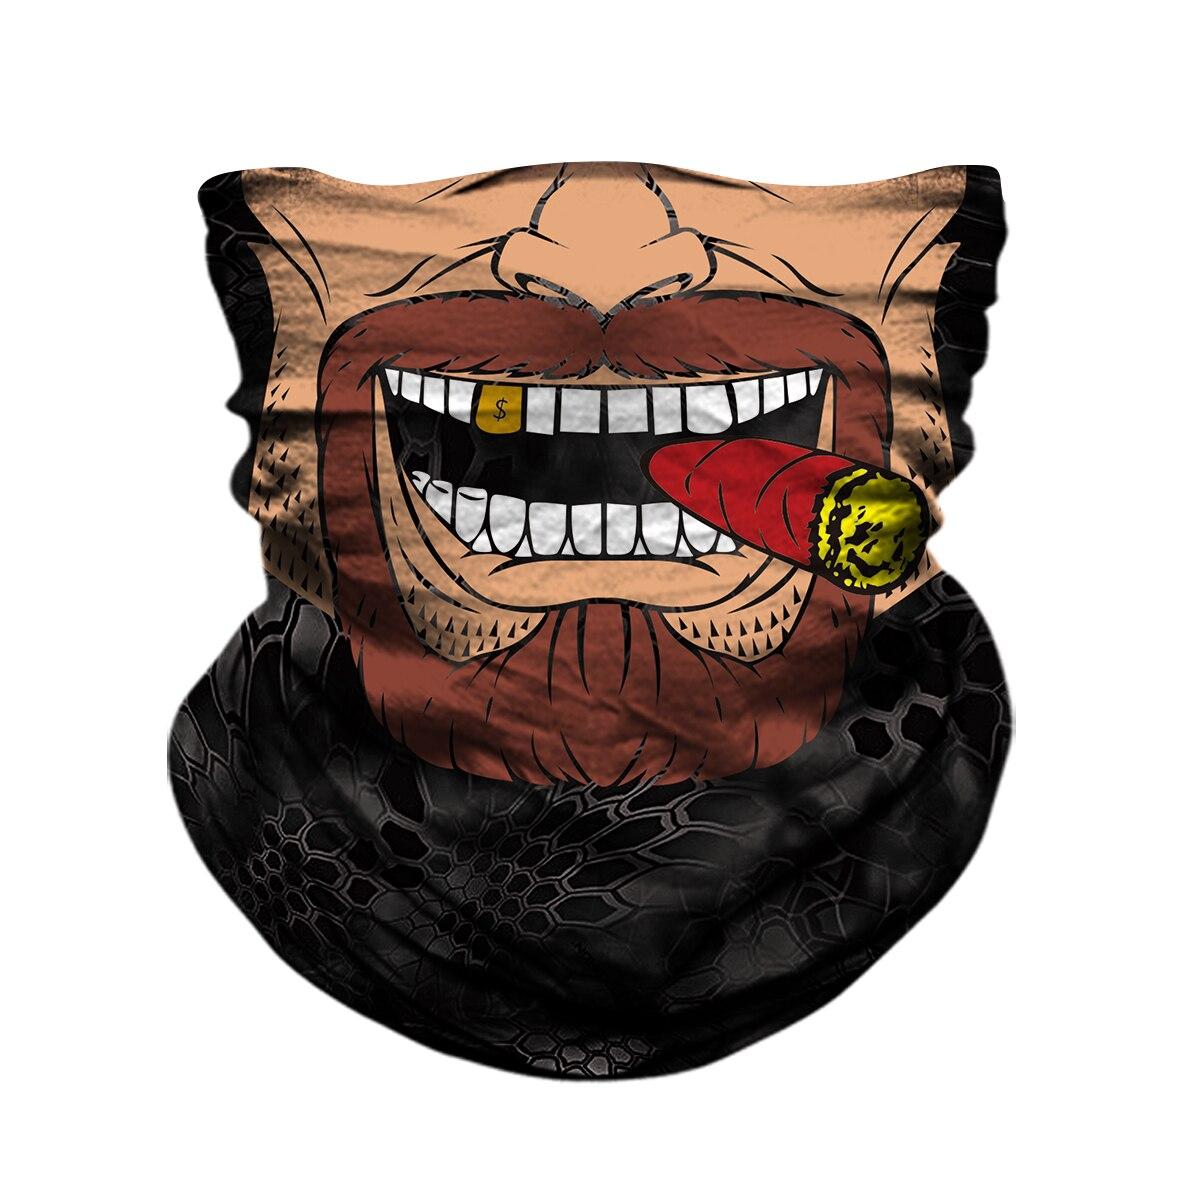 Motorcycle Face Mask Motorbike Headwear Riding Scarf Cycling Neck Headband Fullface Shield Mask Moto Helmet Bandana Motera Cap|Motorcycle Face Mask|   - AliExpress